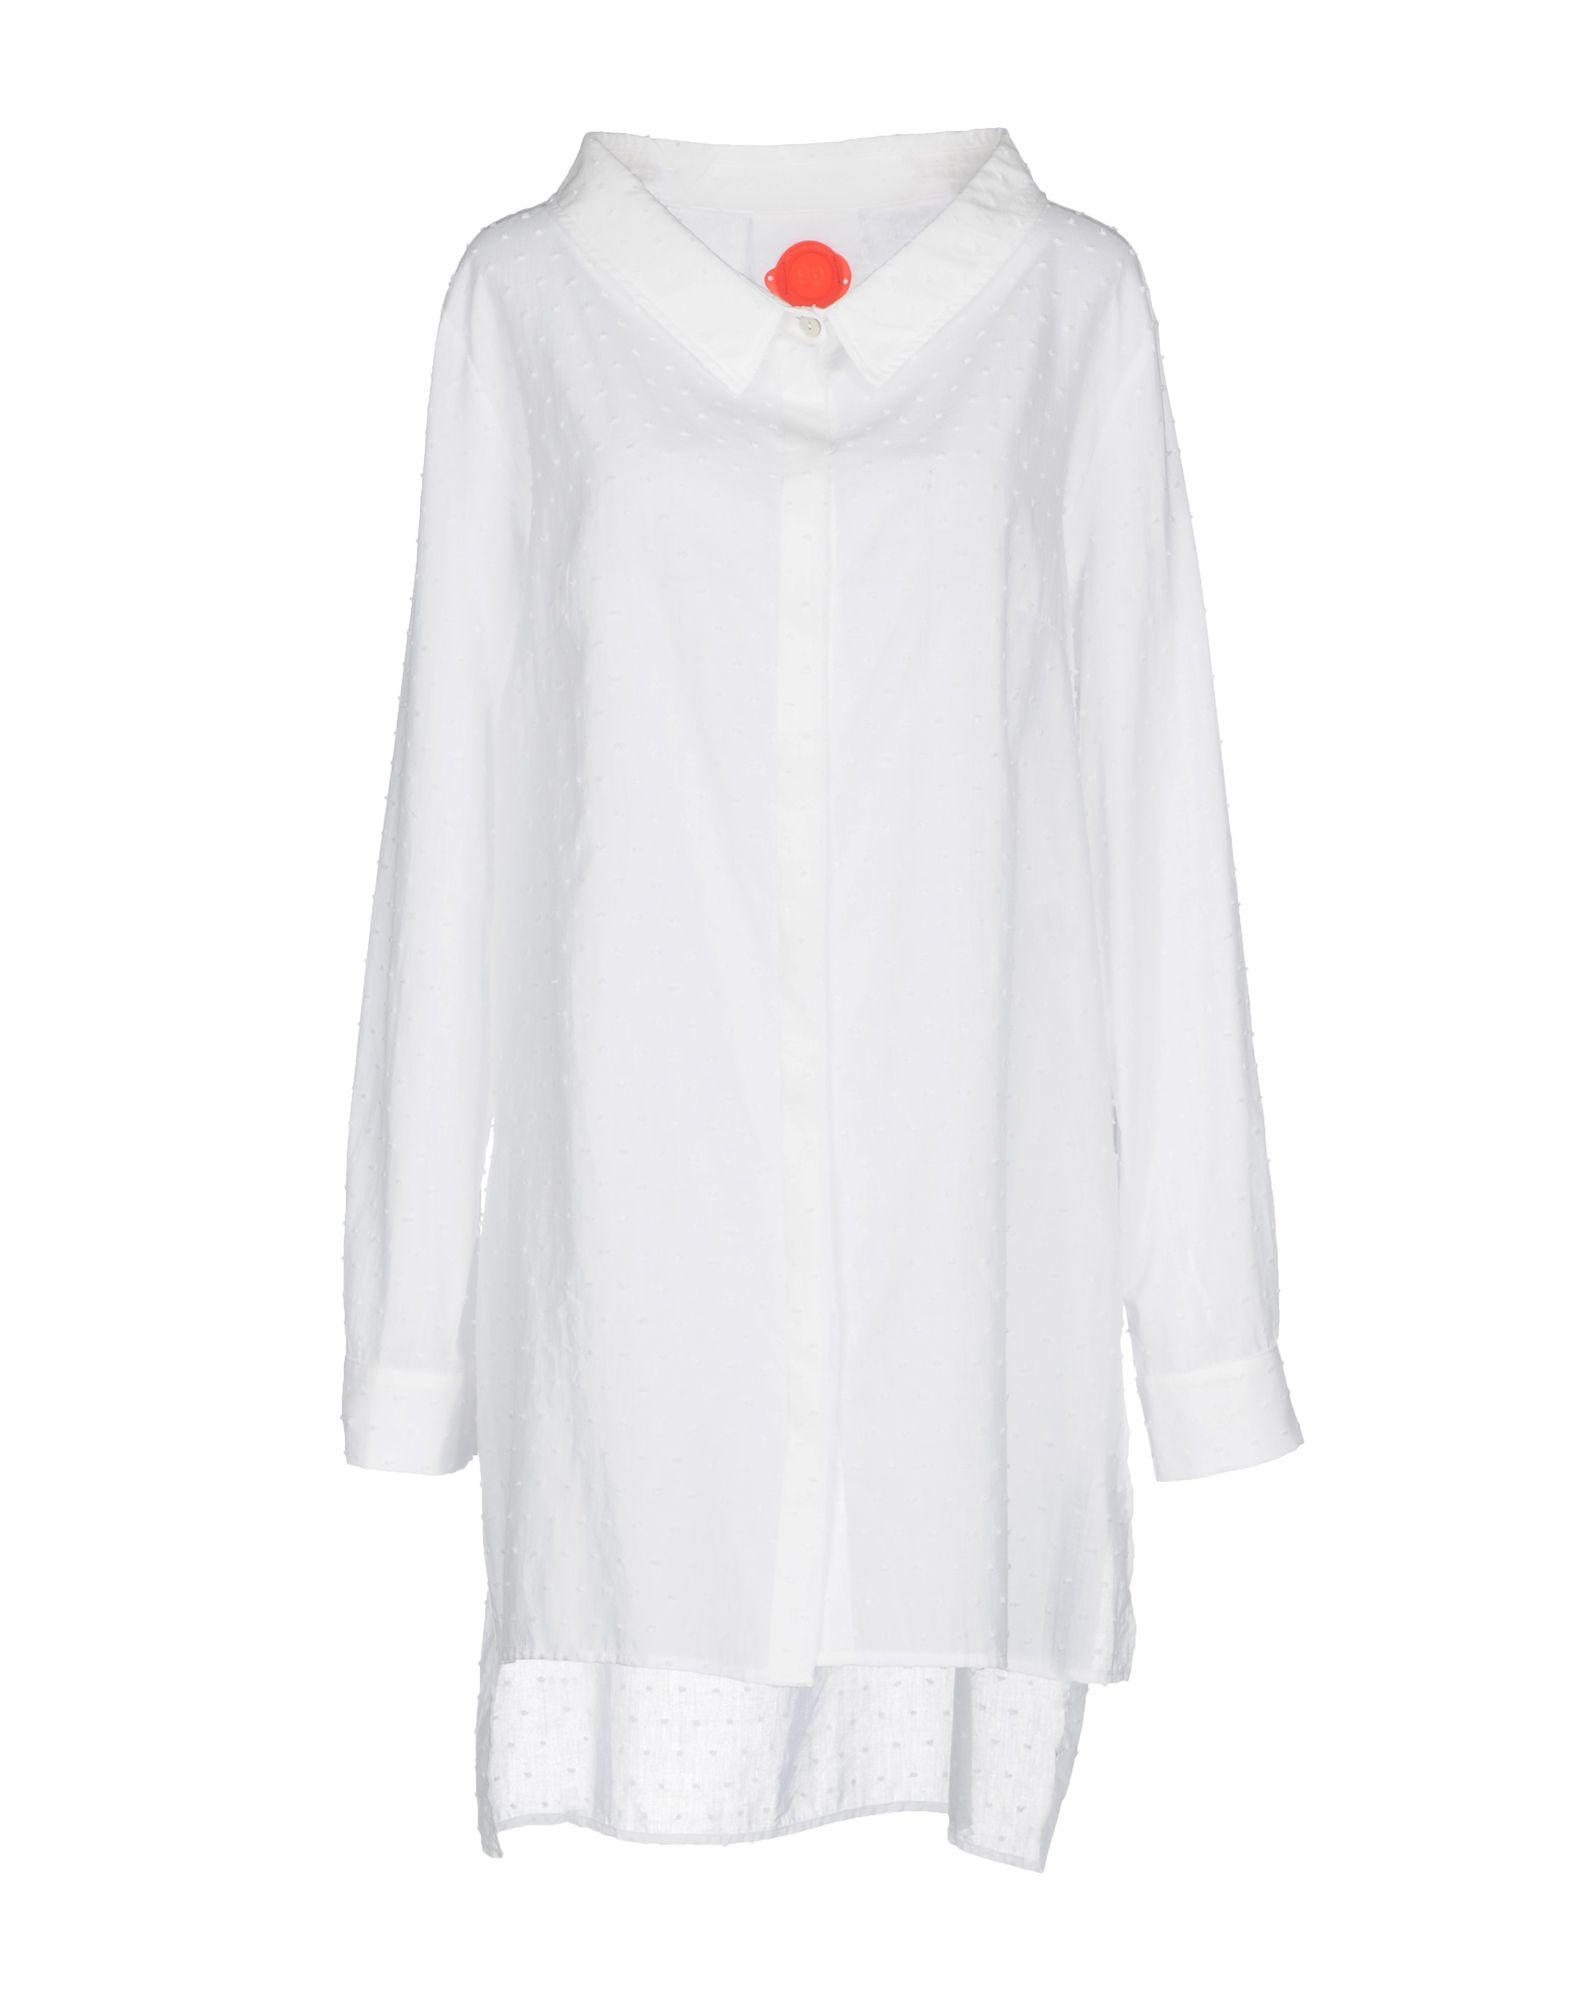 ФОТО ultra'chic pубашка